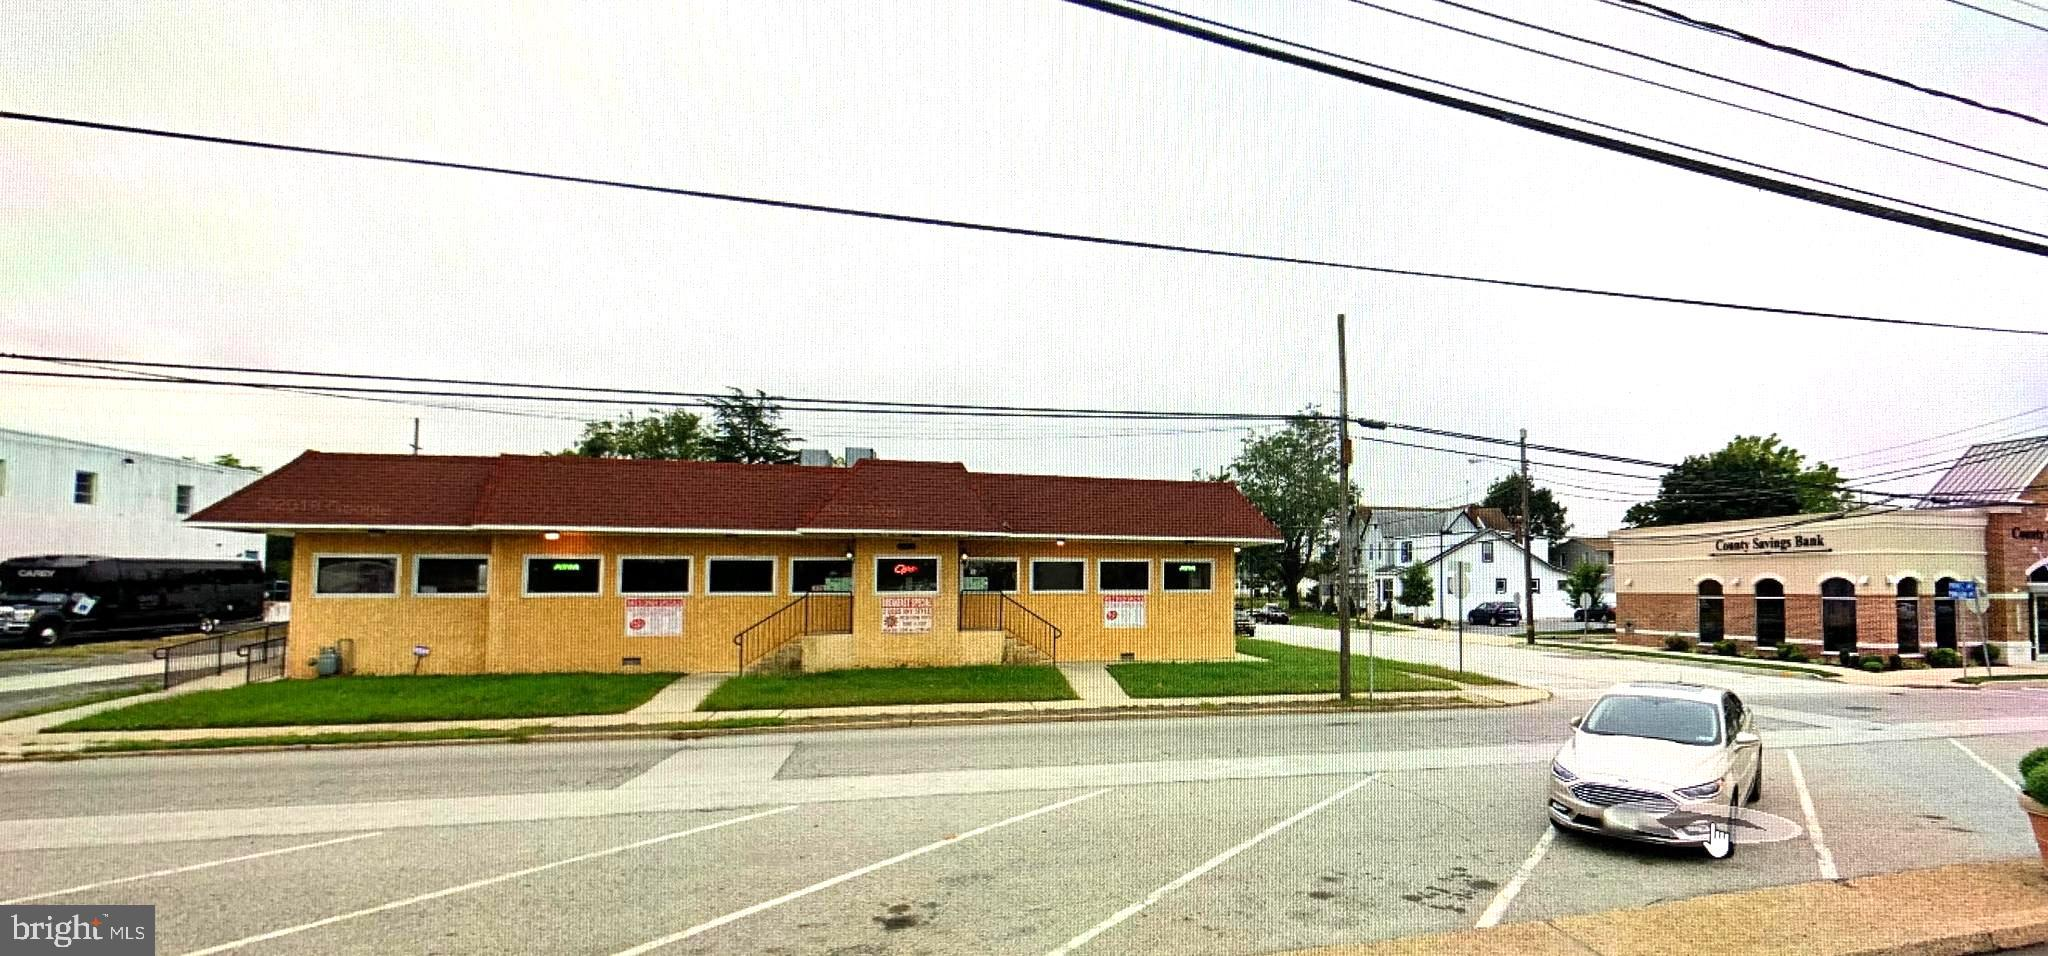 118 Printz Ave, Essington, PA, 19029